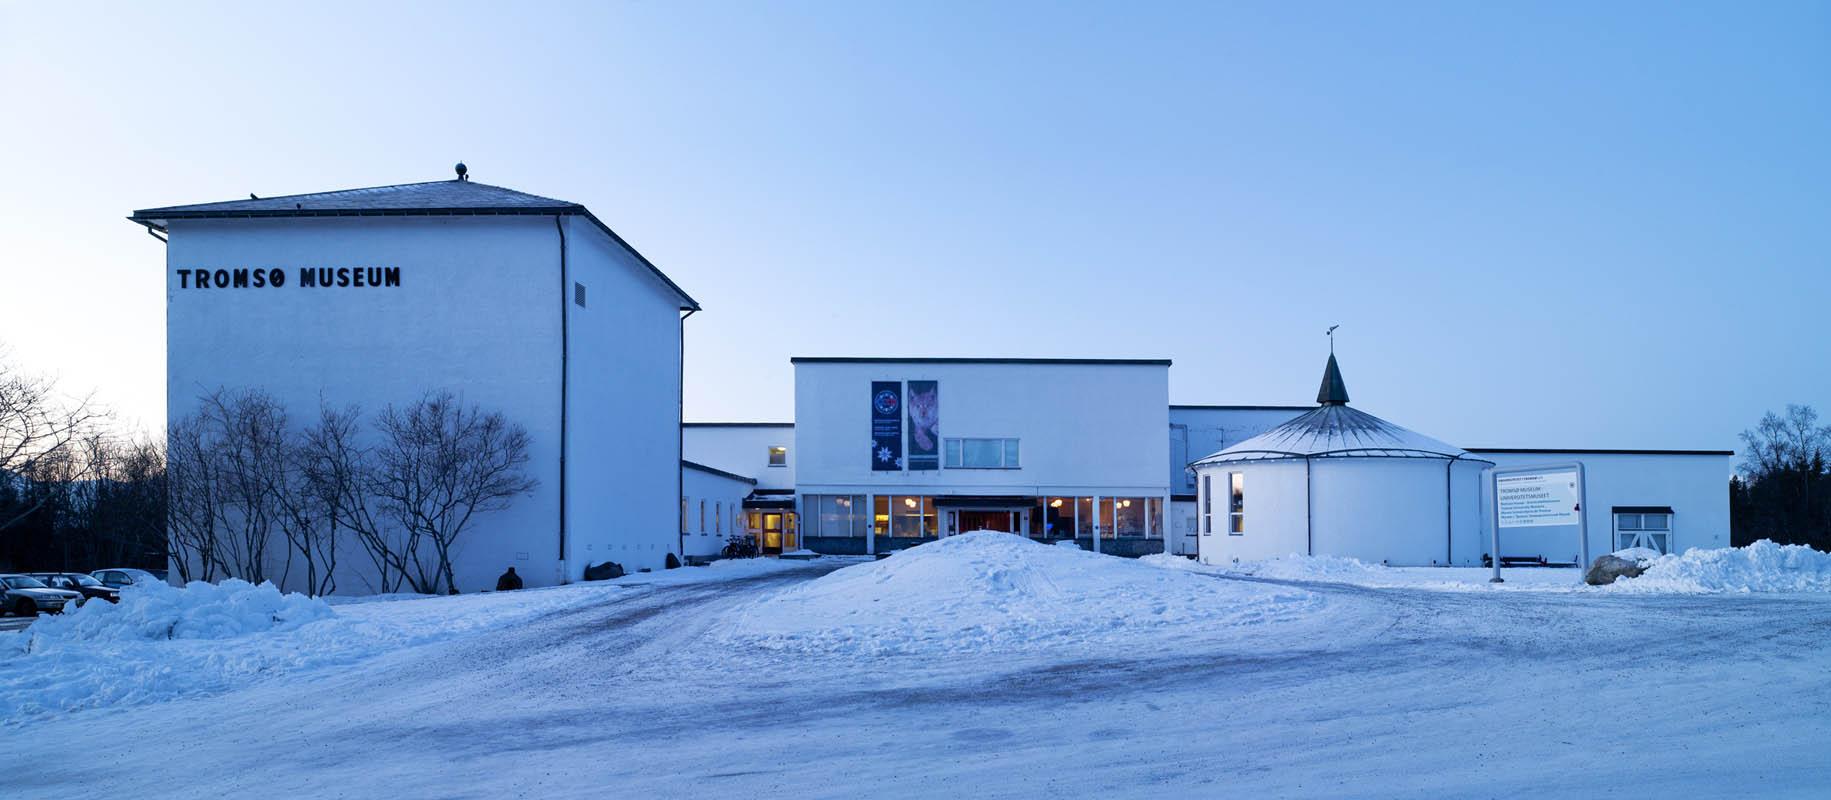 The museum during winter © Tromsø Museum